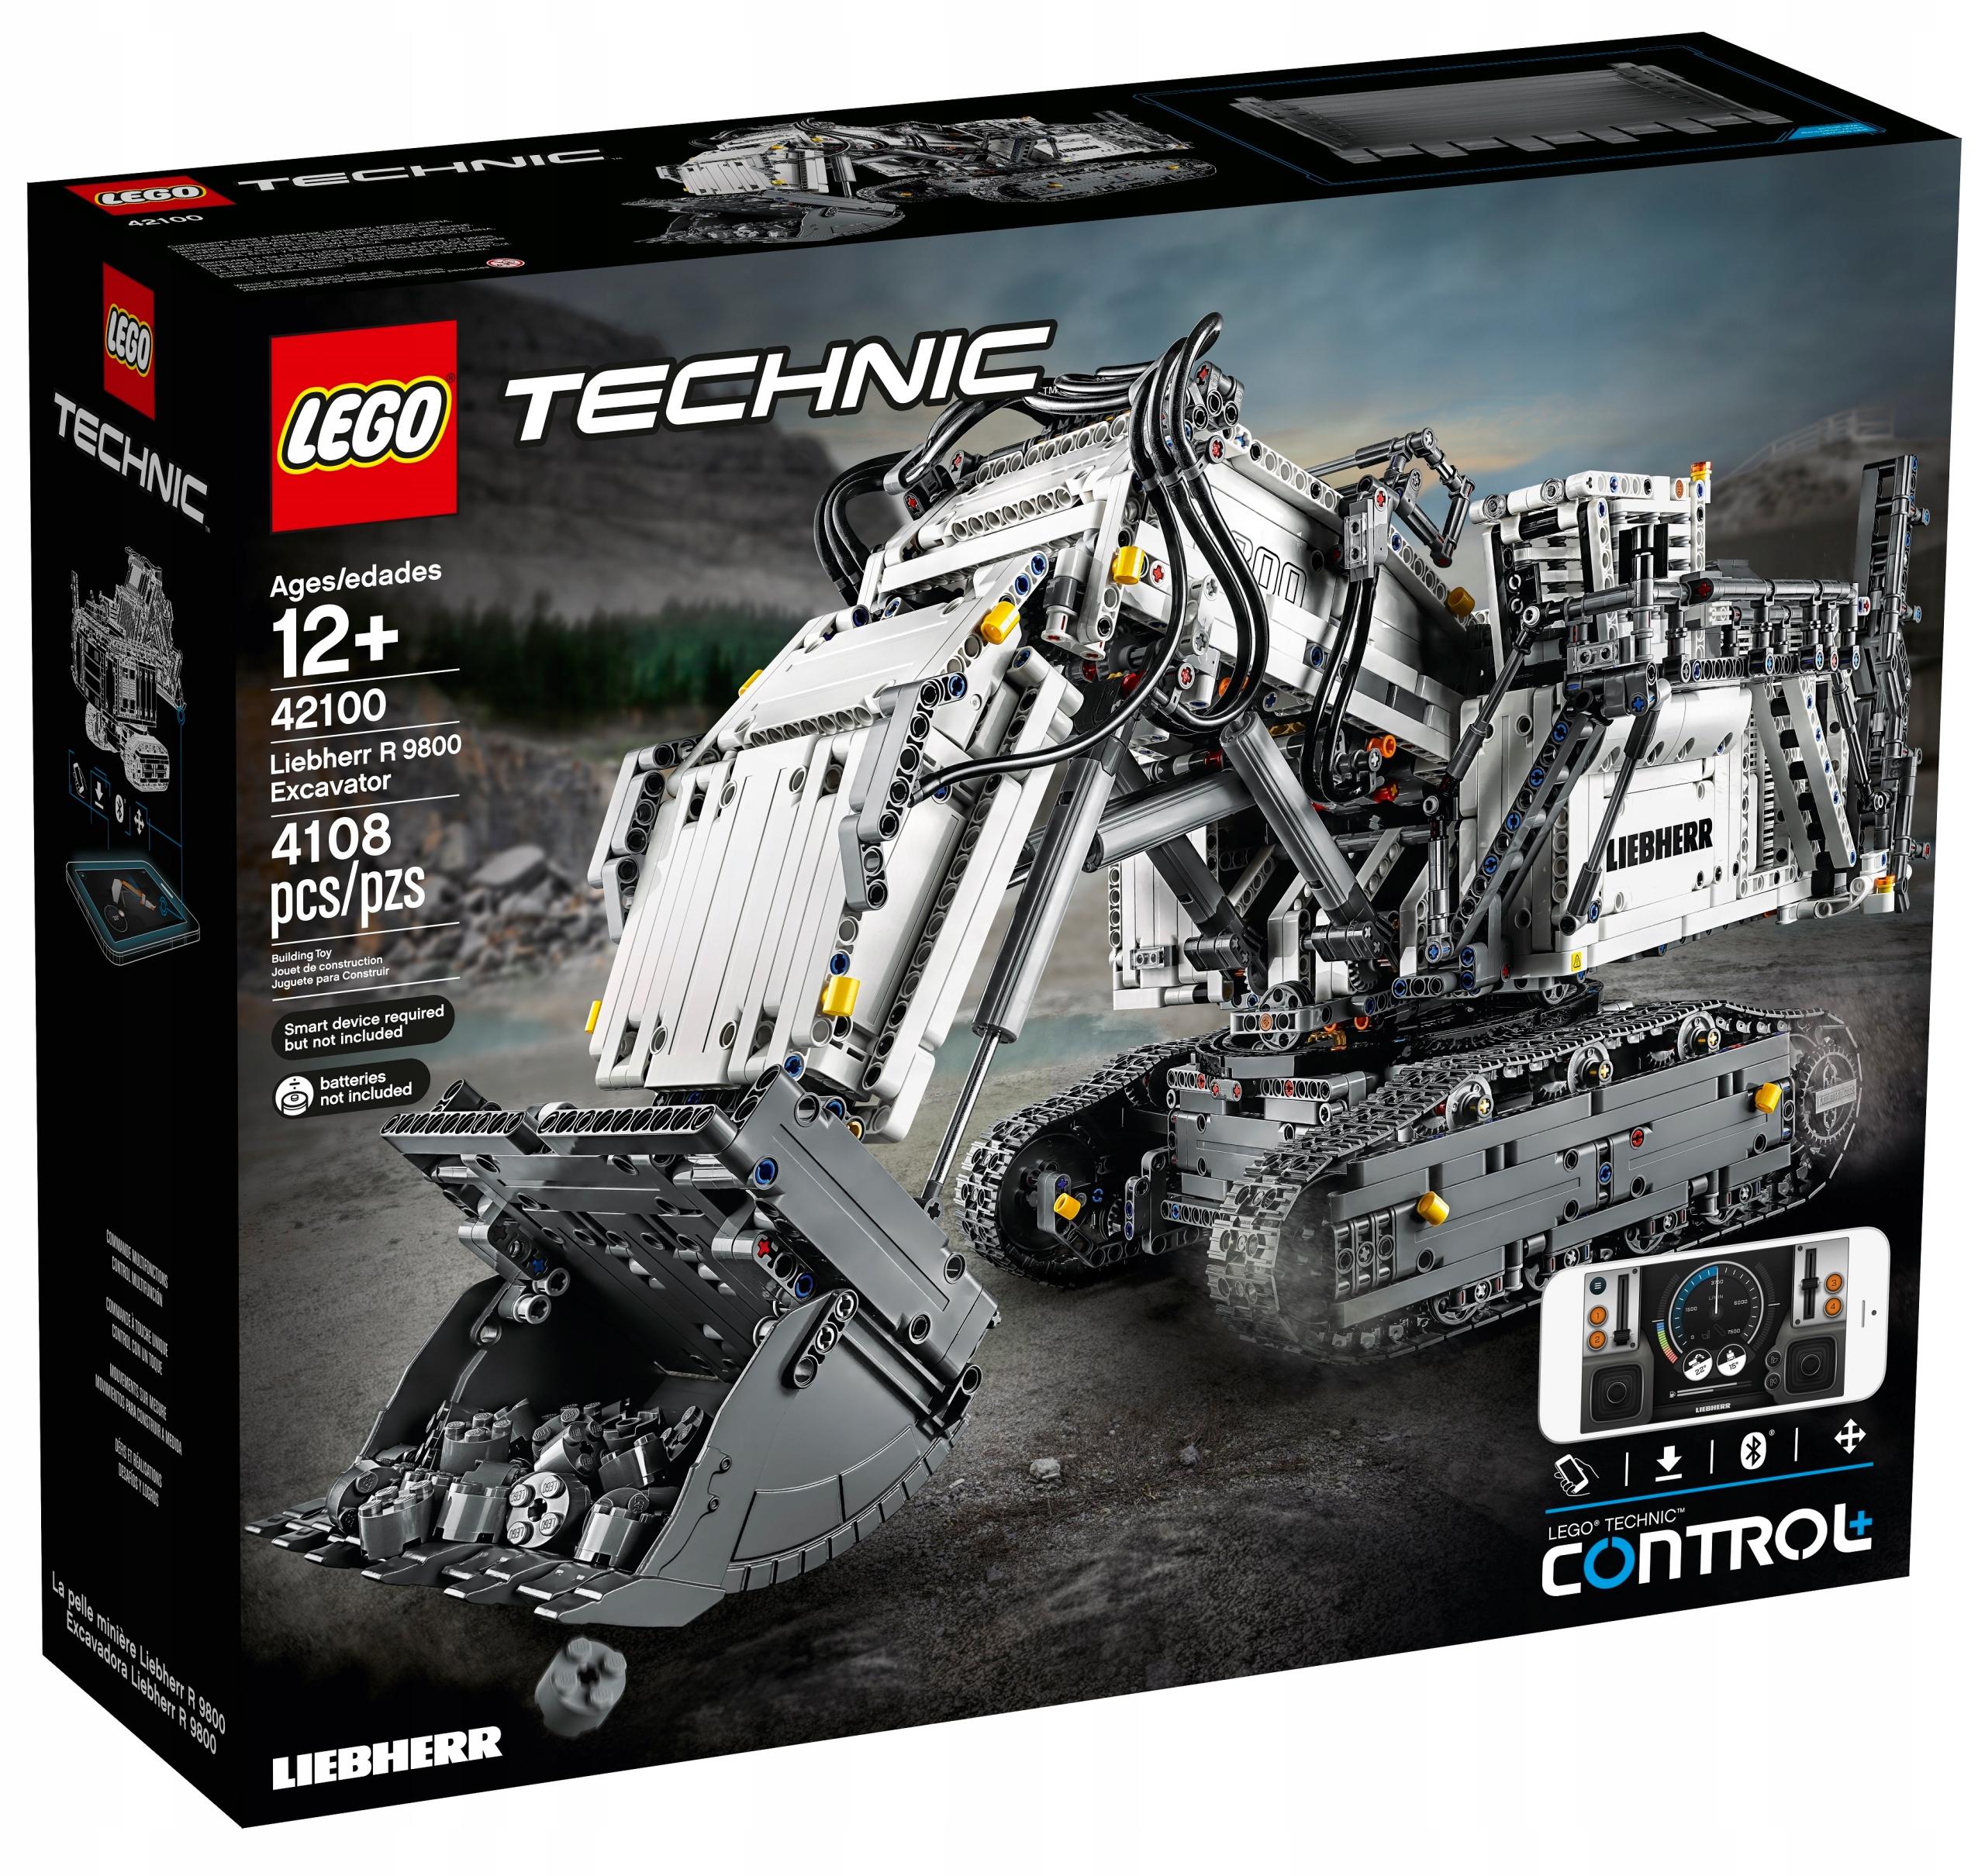 LEGO Technic 42100 - Koparka Liebherr R 9800